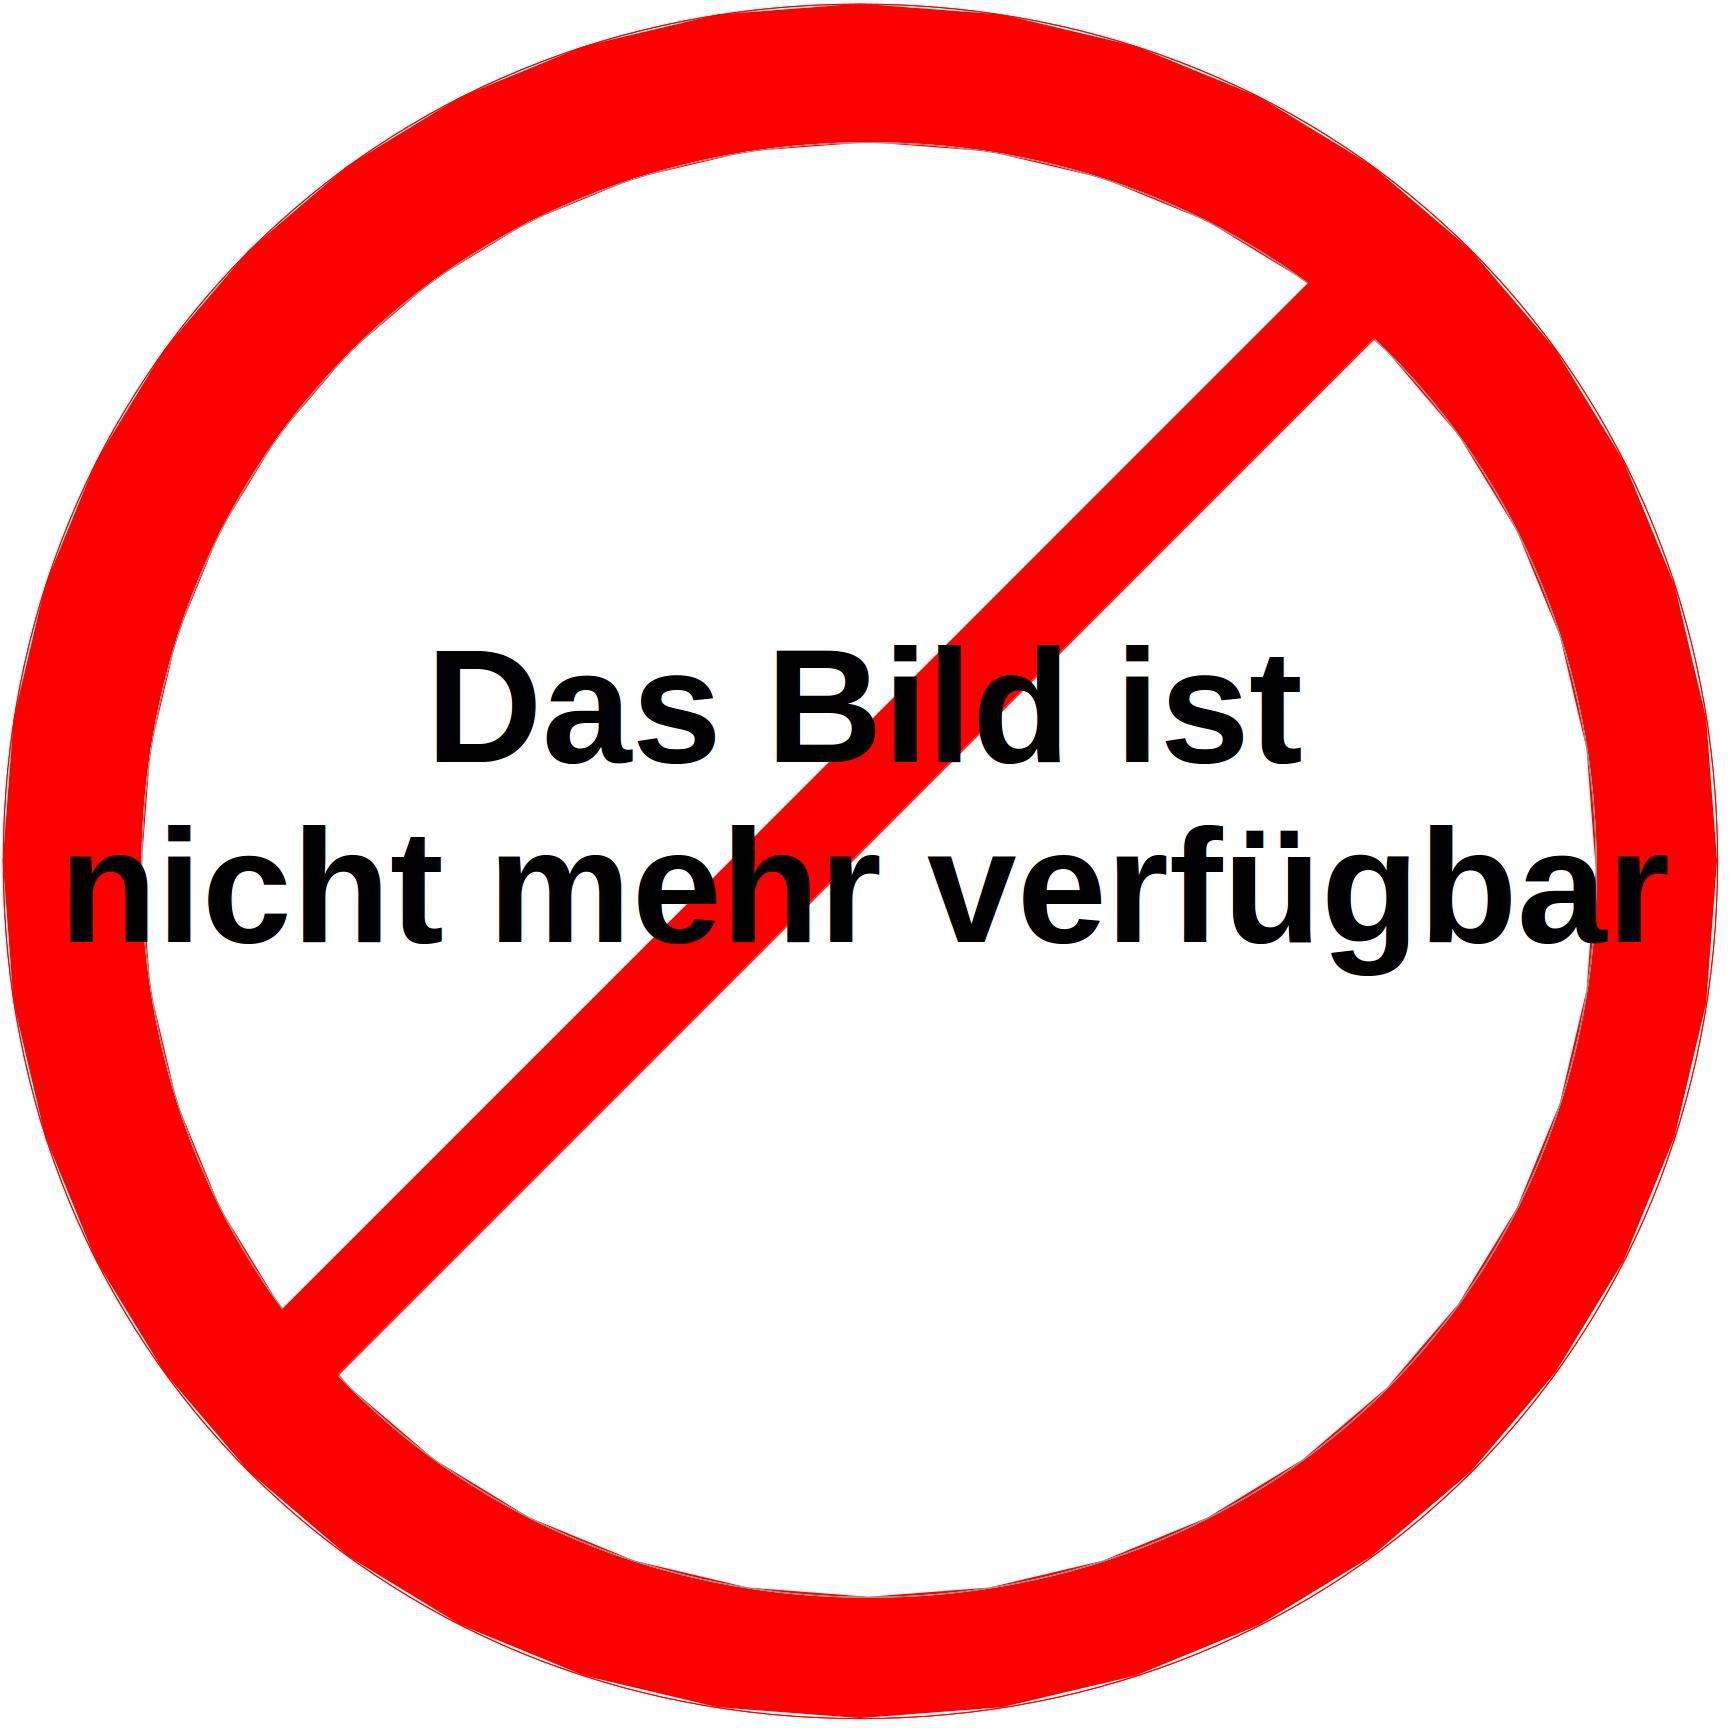 INNENANSICHTEN - Ausblick_v__Bad -Top 4